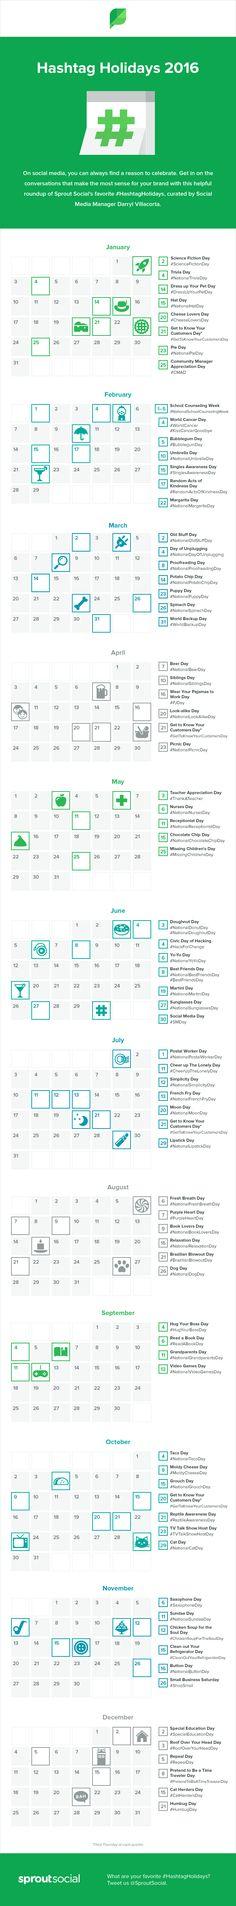 Hashtag-Holidays-Infographic #socialmediamarketingtips